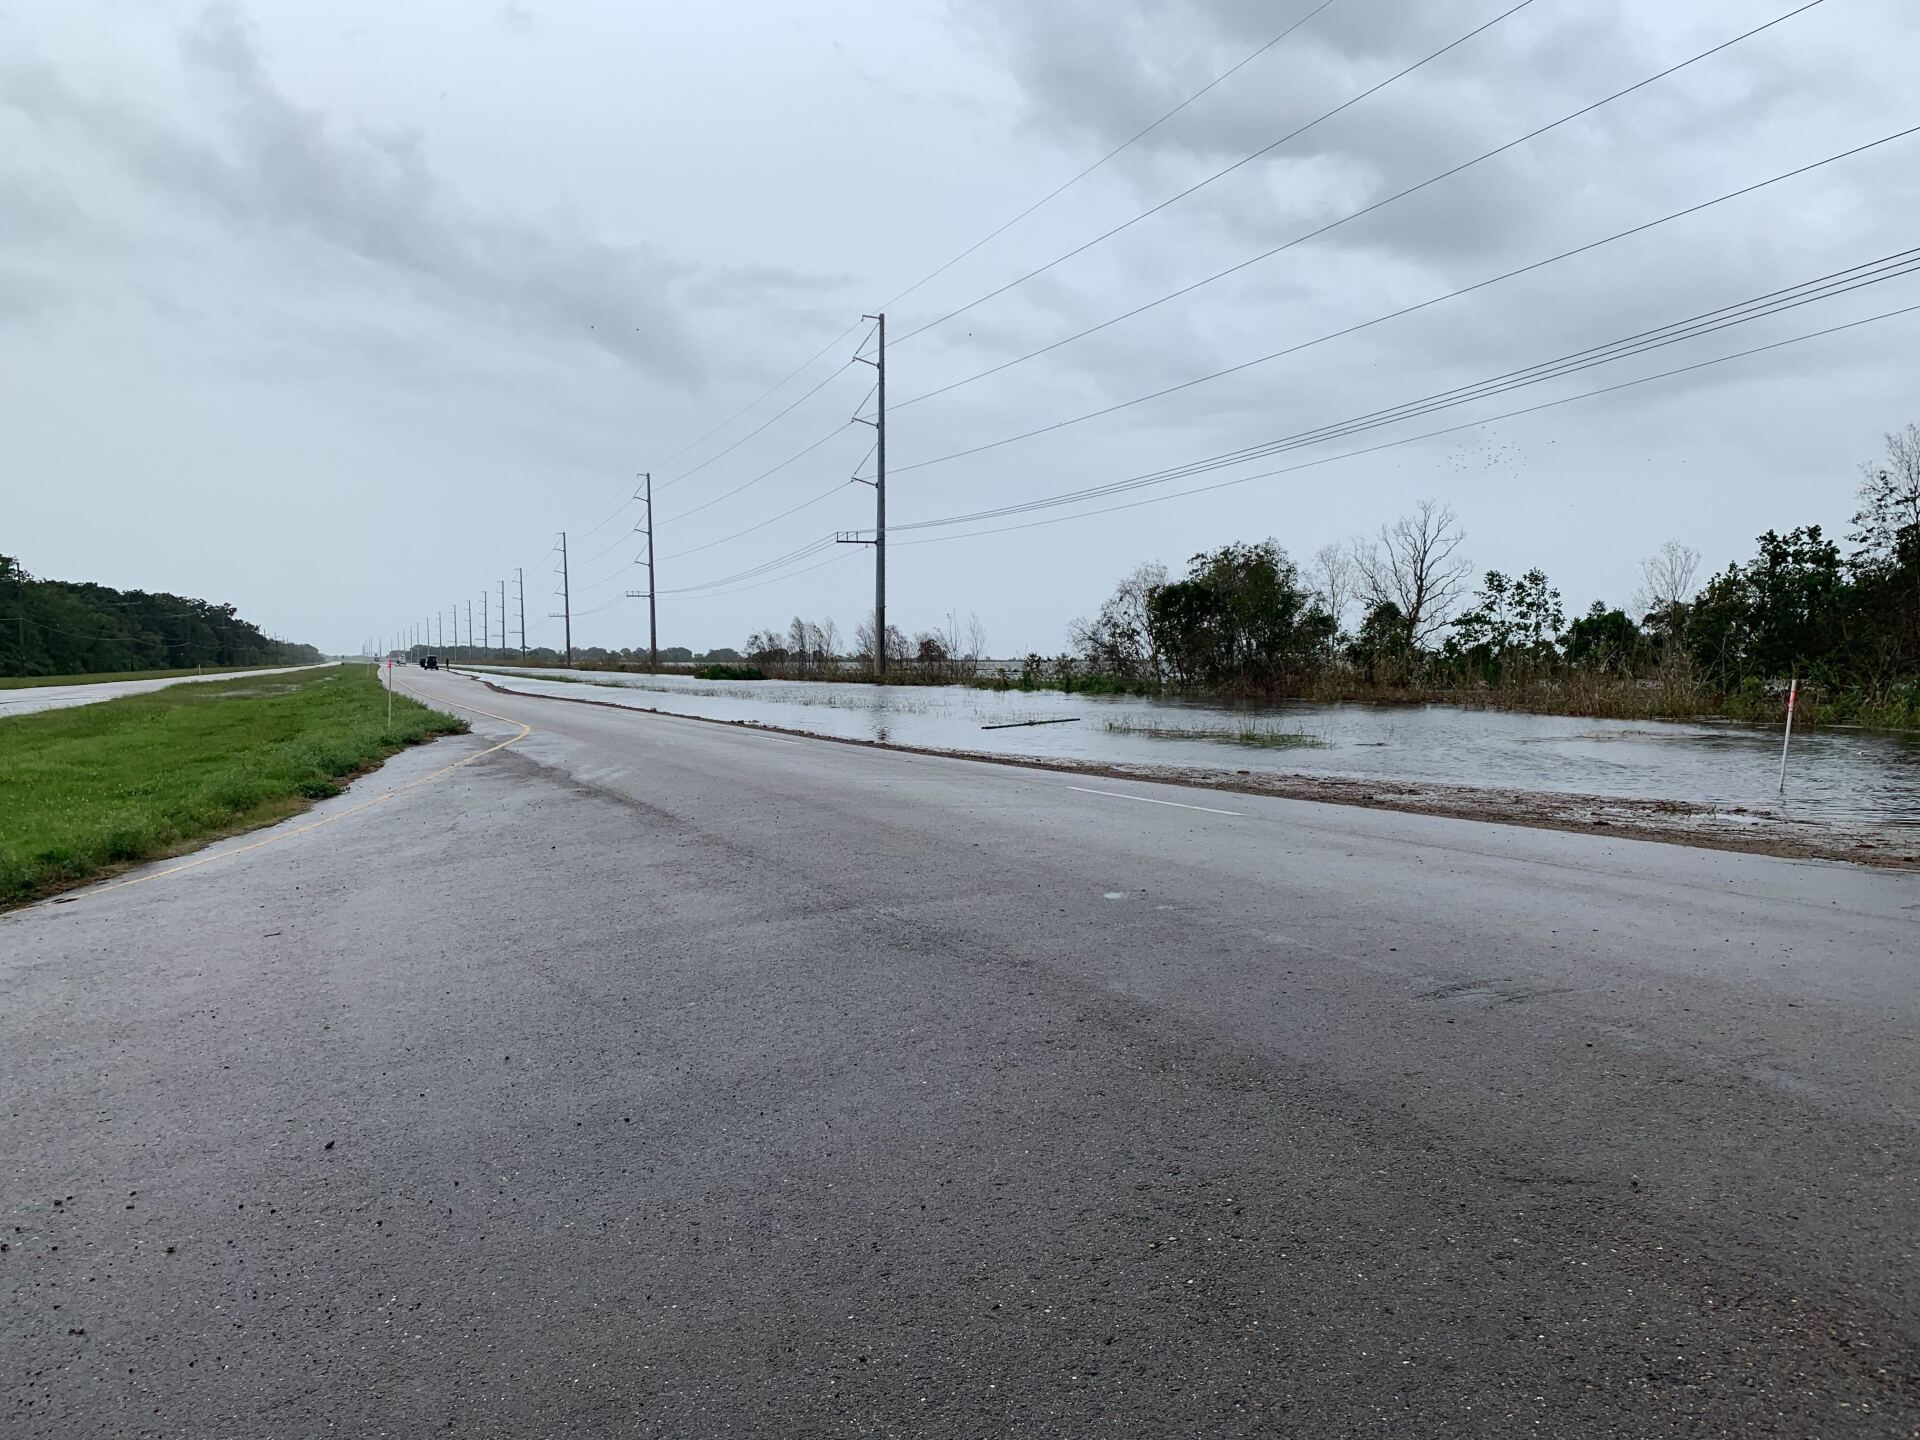 Barry flooding in Plaquemines Parish Louisiana